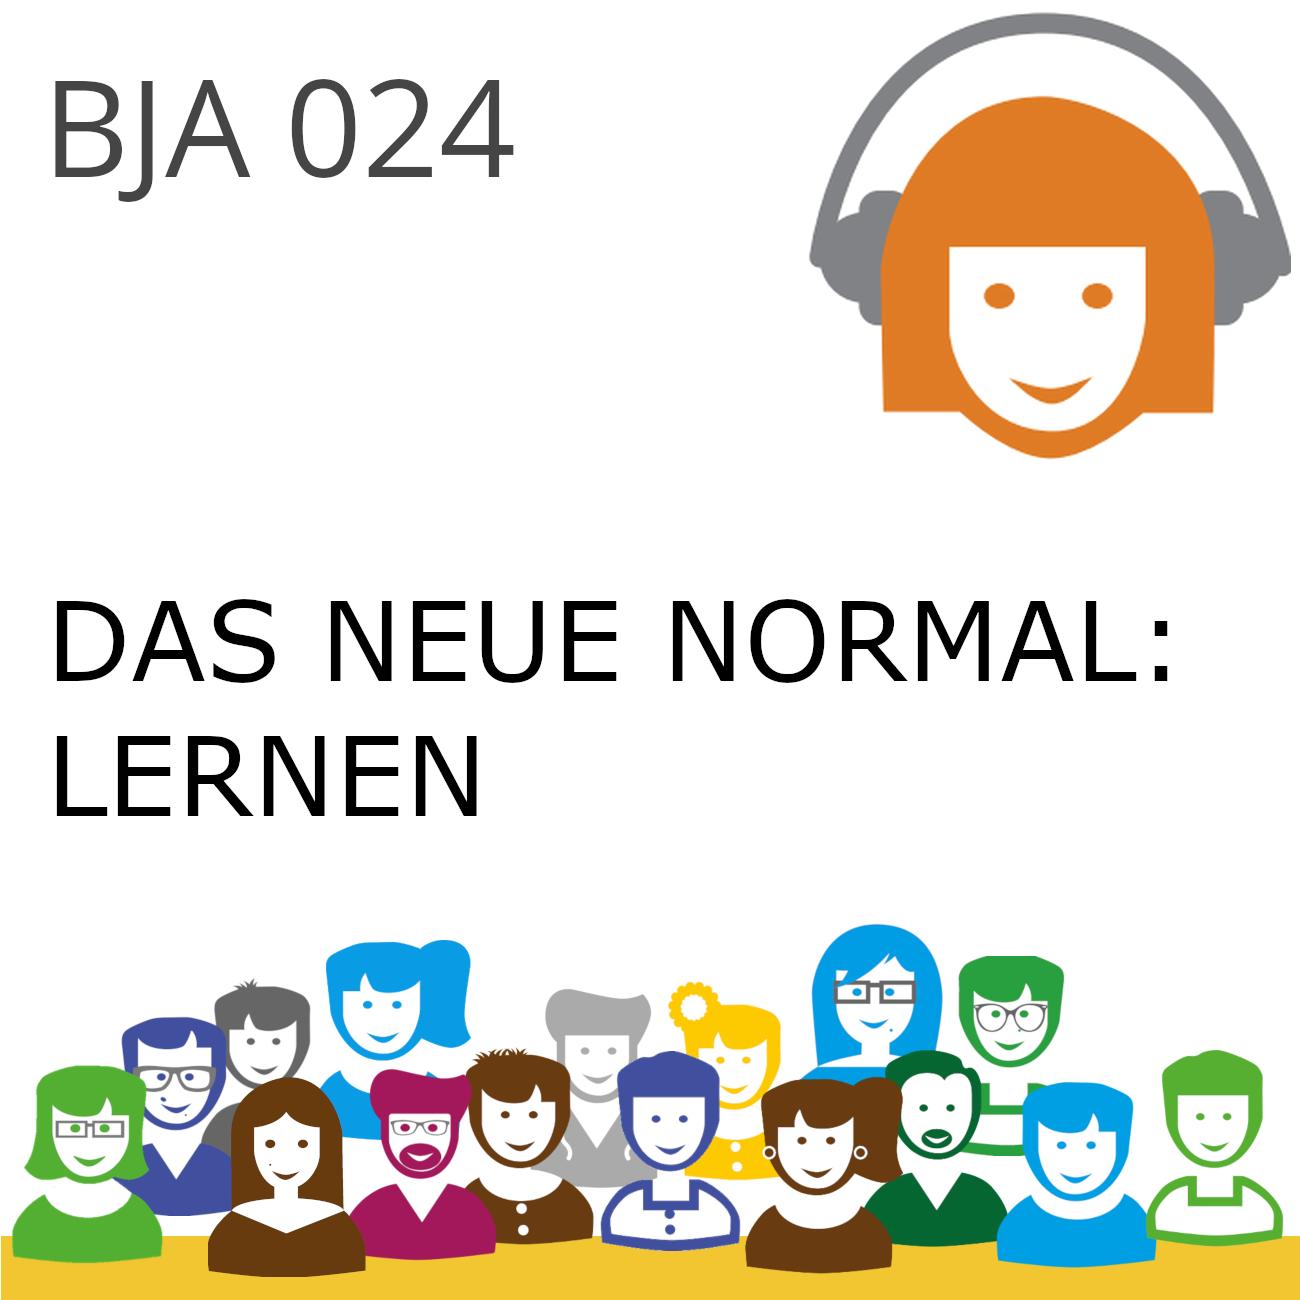 BJA024 | Das Neue Normal: Lernen